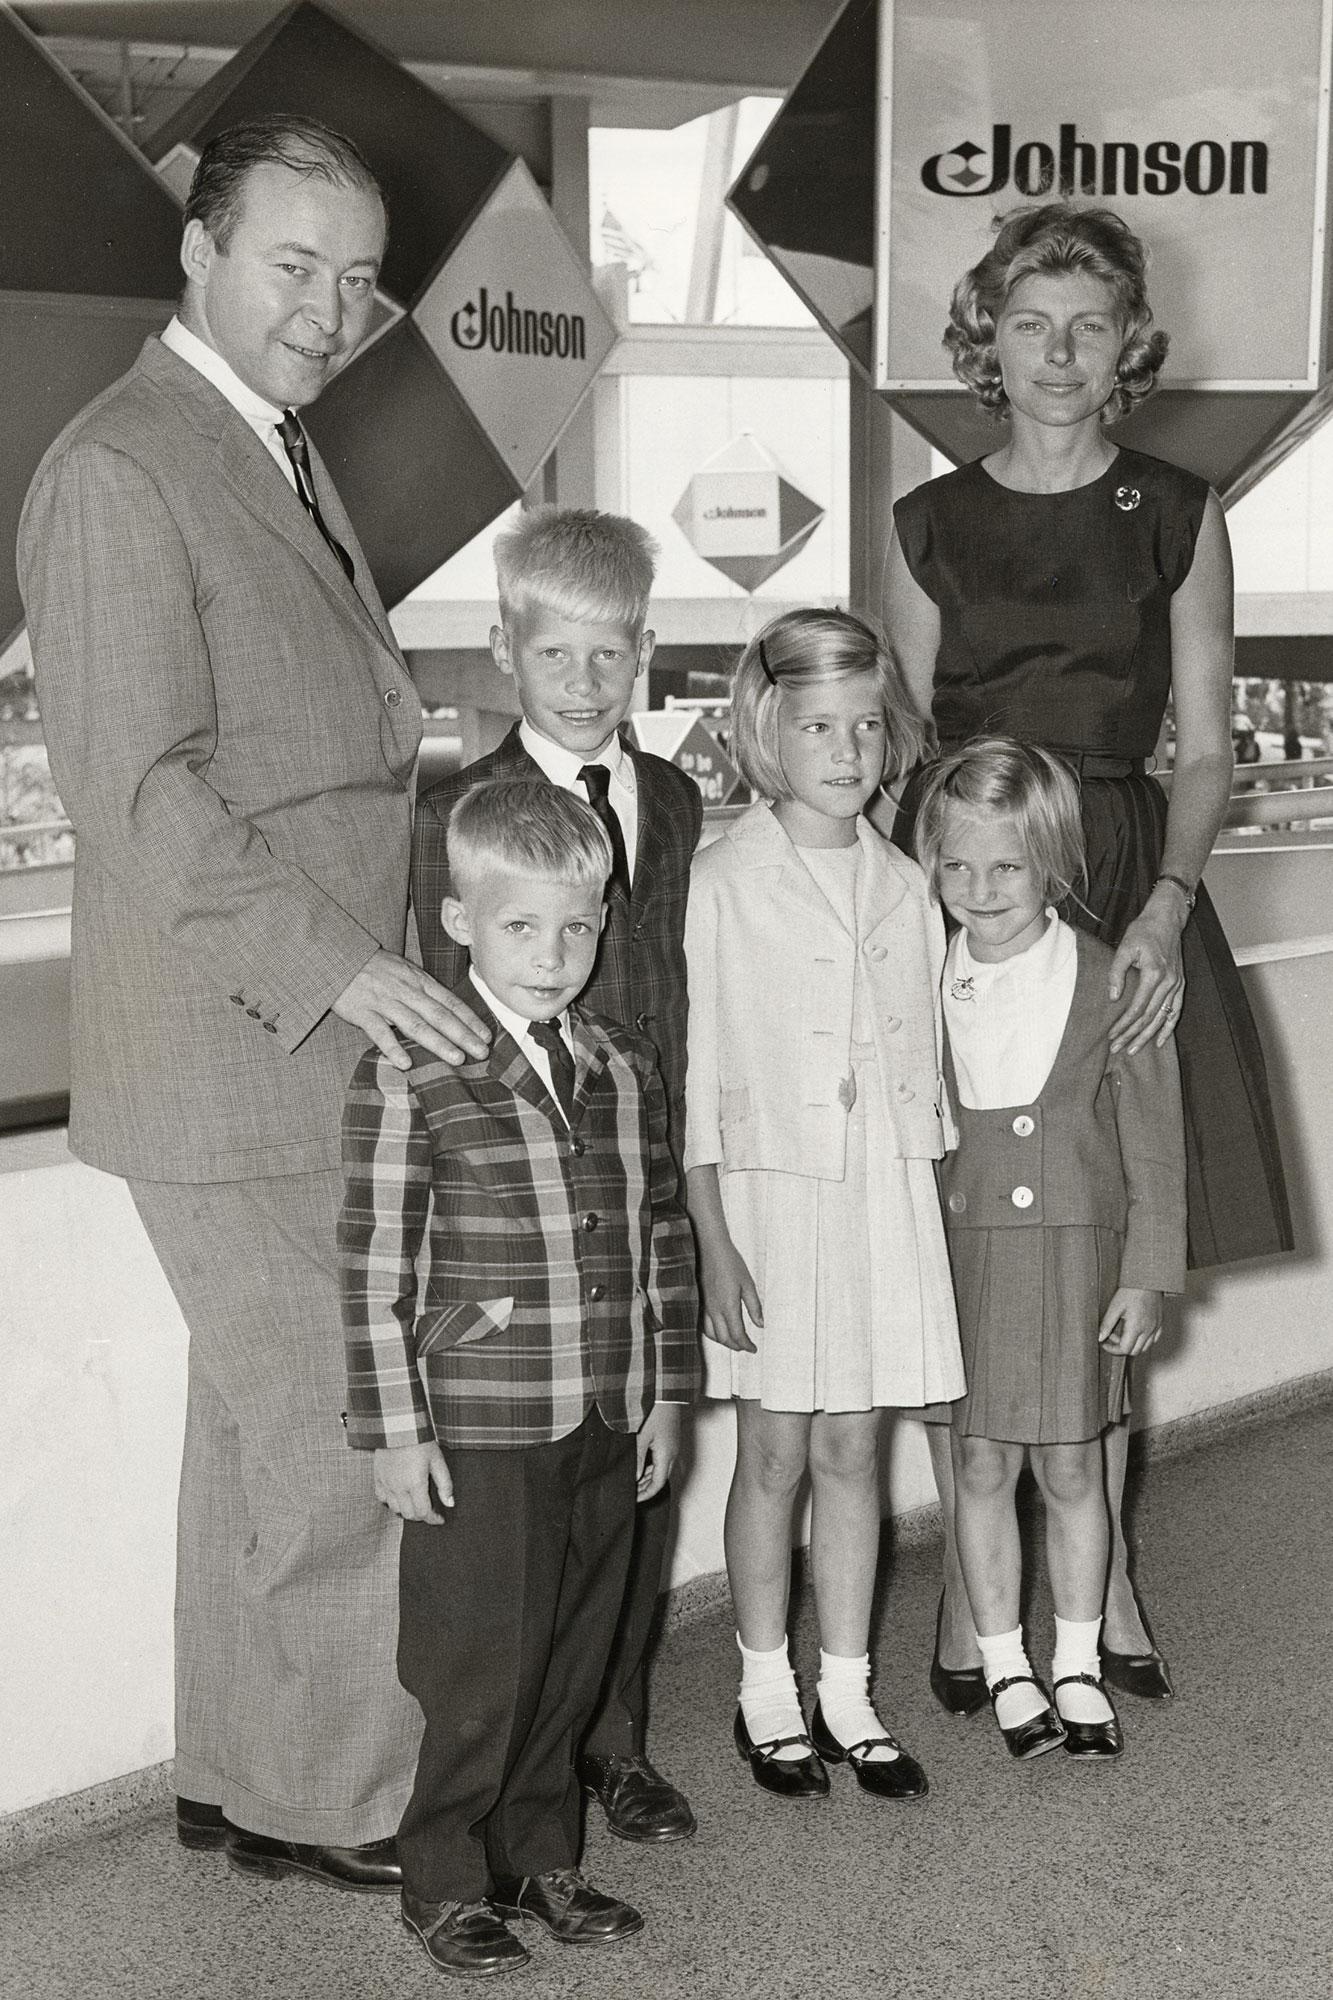 Imogene Johnson with Samuel C Johnson and children at the 1964 World's Fair